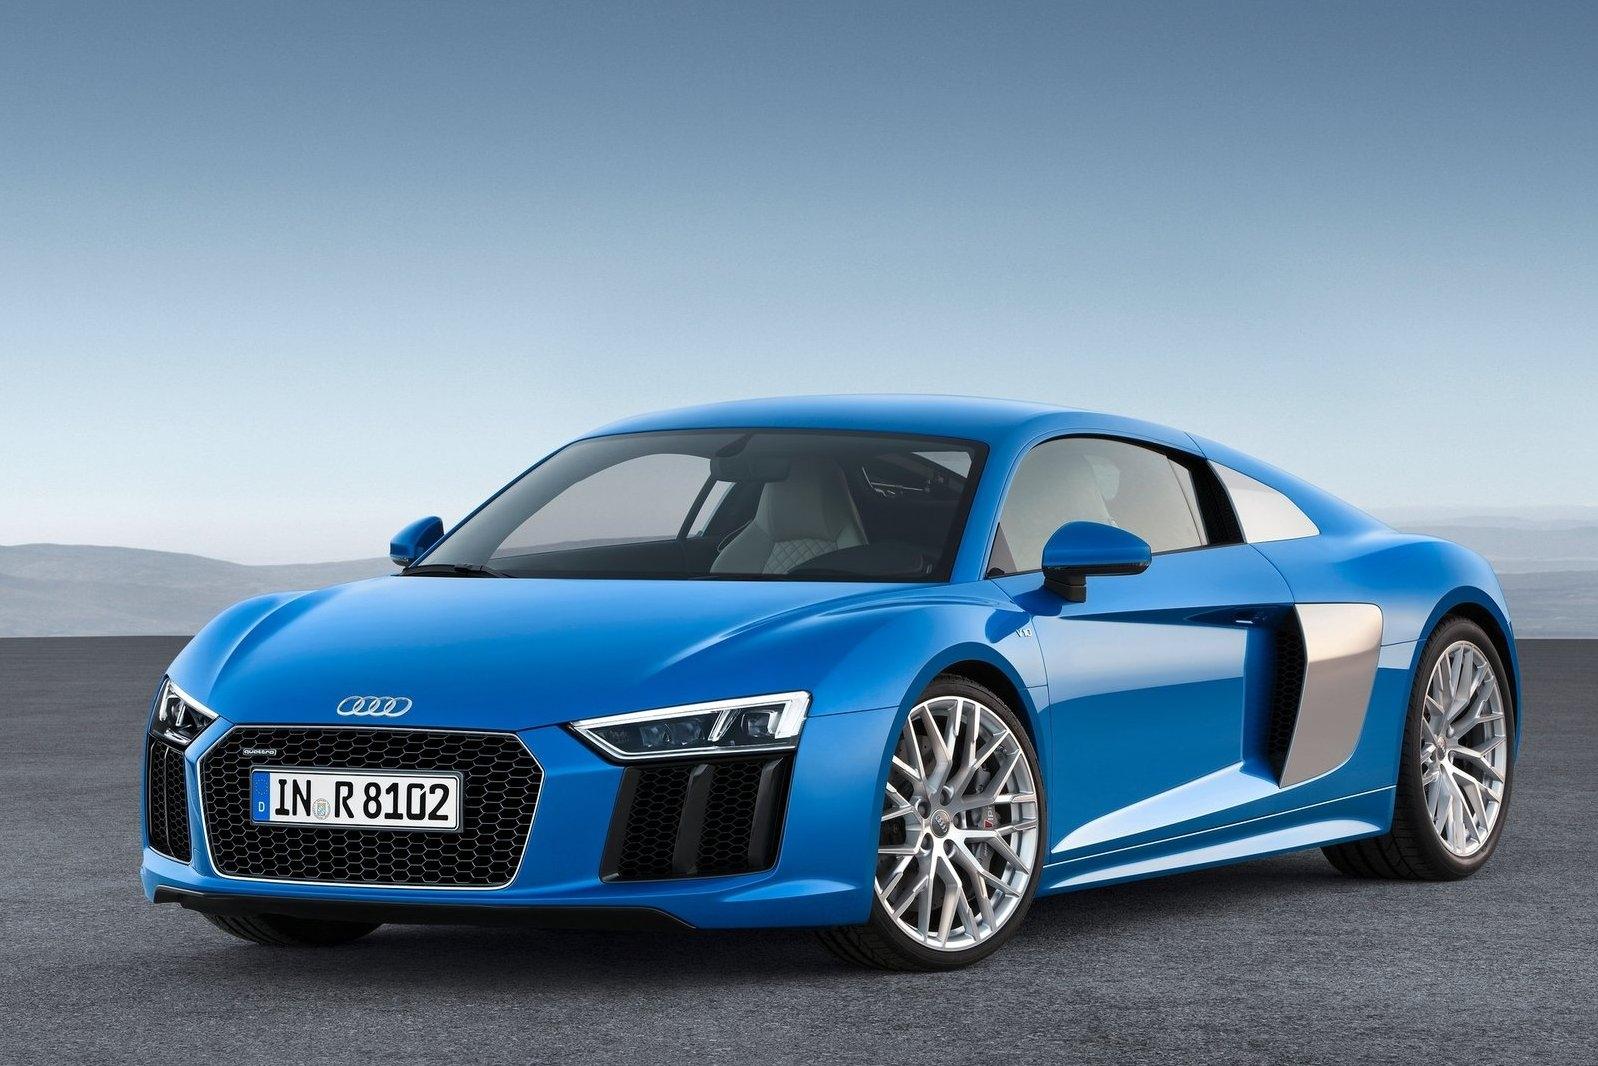 Audi-R-V-Audi-R-V-Plus-Beastie-Toys-By-Wheelsandmore-car-audi-r-v-wallpaper-wpc5801268